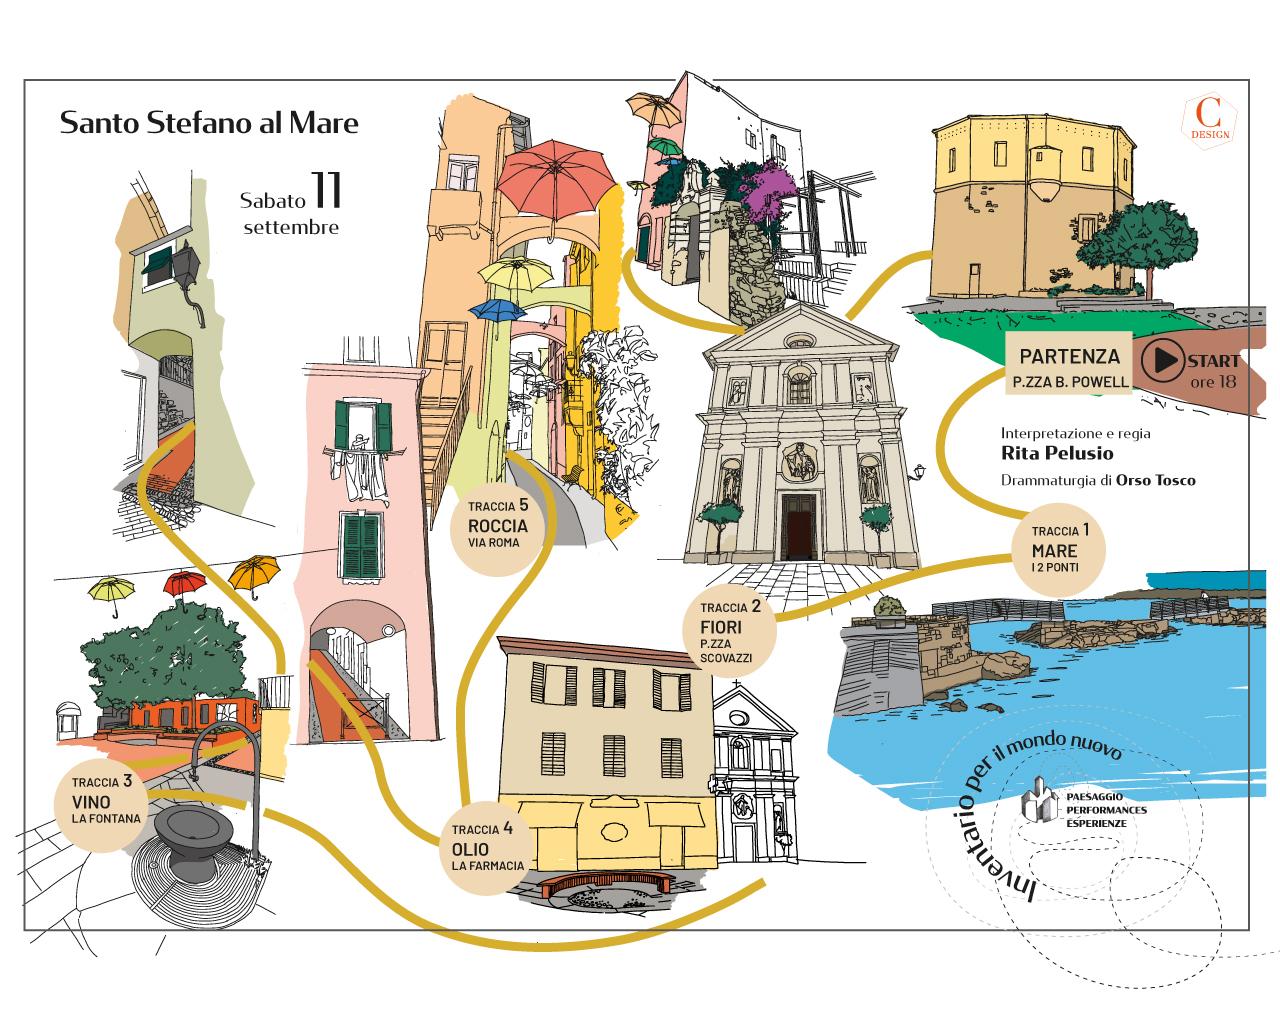 cartina, infografica, illustrator, graphicdesign